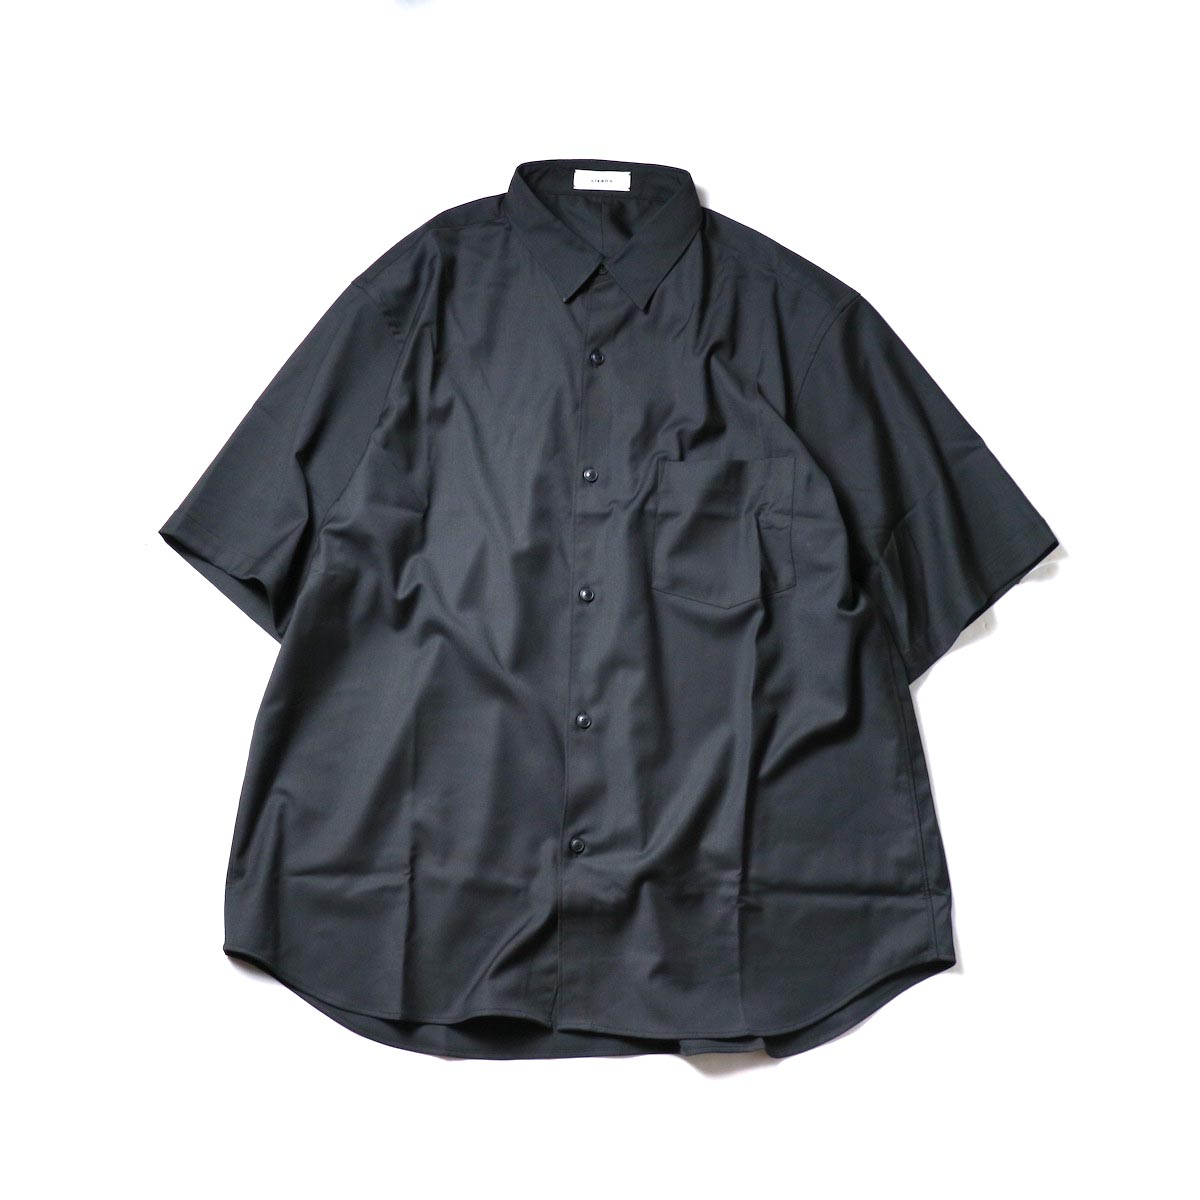 alvana / Wrinkle Proof Shirts (Black)正面